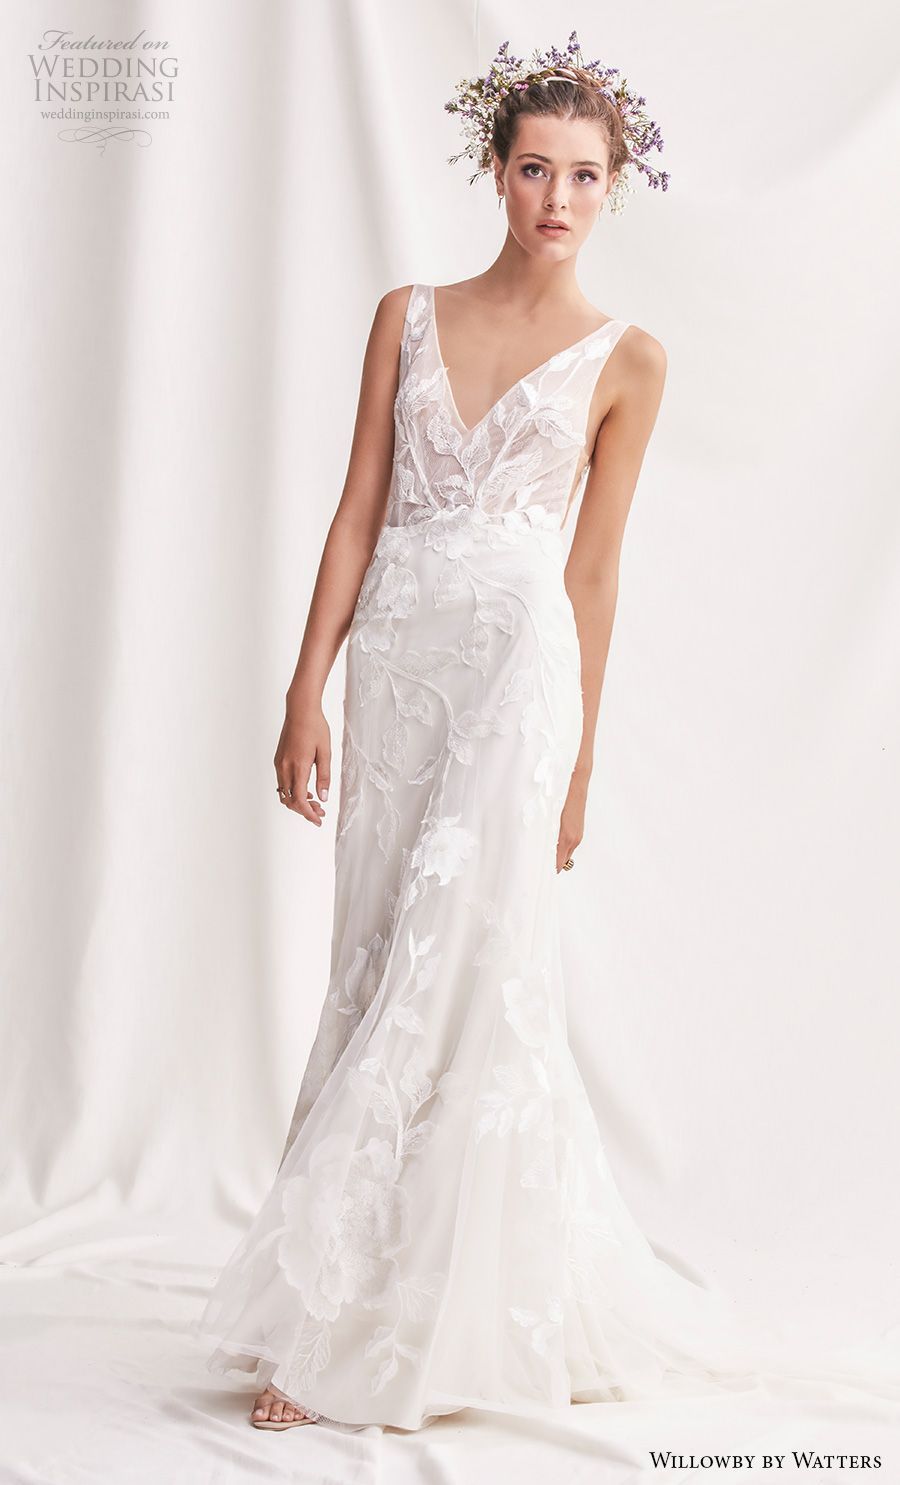 Simple elegant wedding dress designers  Willowby by Watters Spring  Wedding Dresses  Wedding